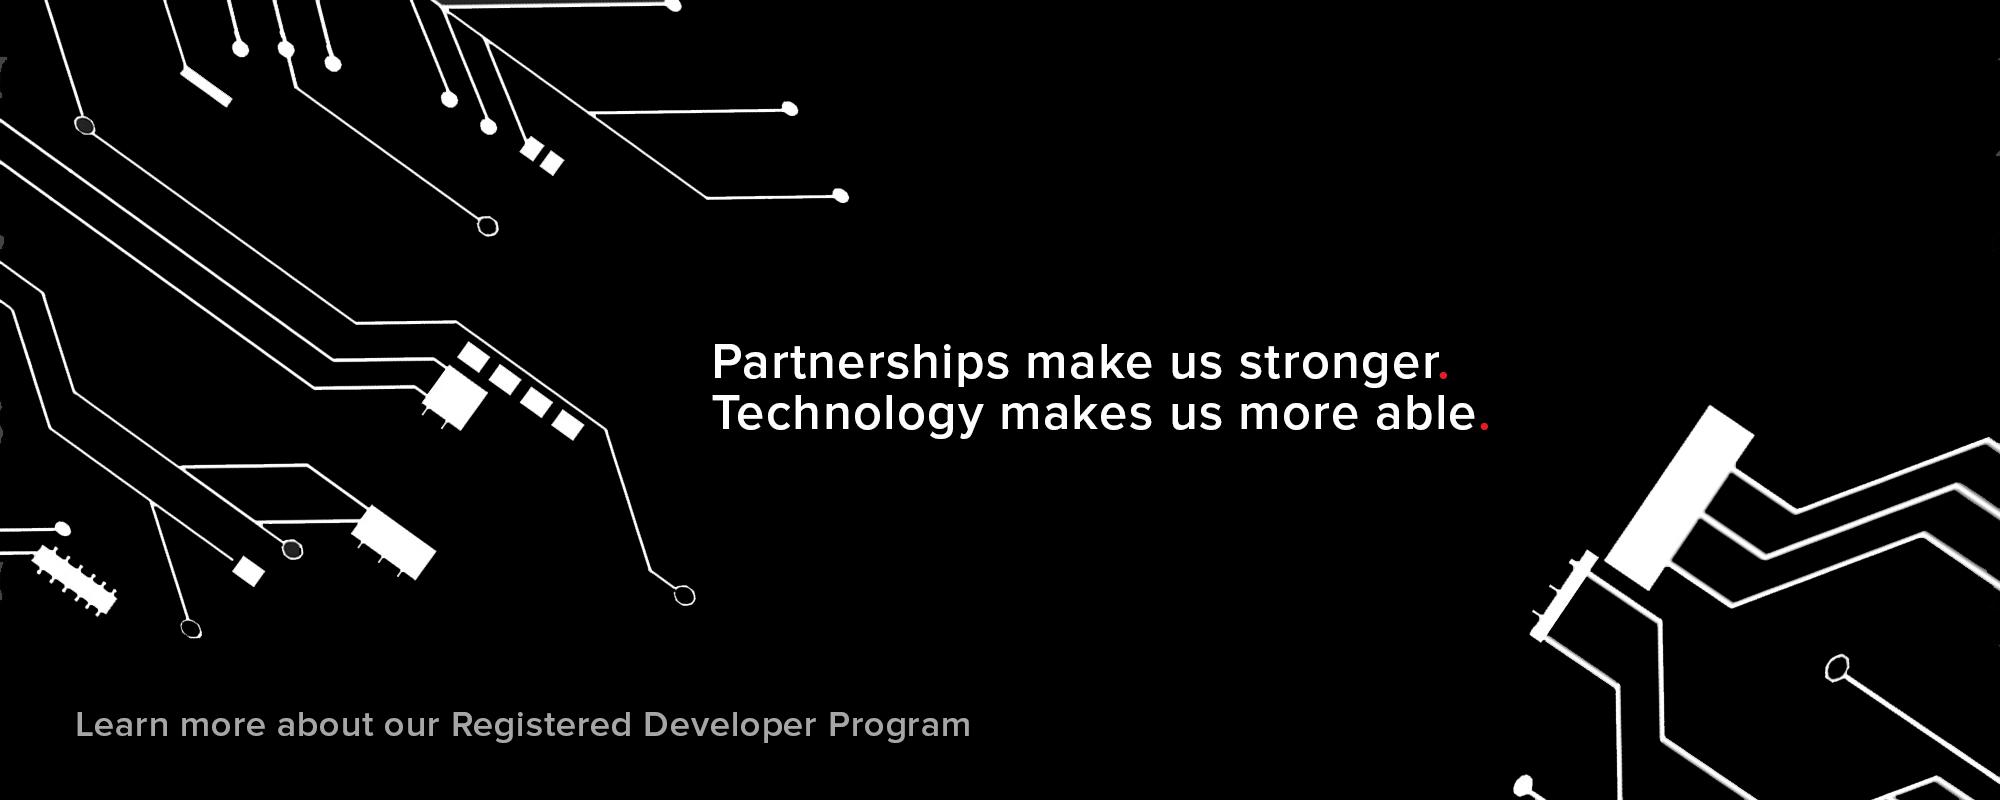 Partnerships Make Us Stronger. Technology Makes Us More Able. Learn More About Our Registered Developer Program.